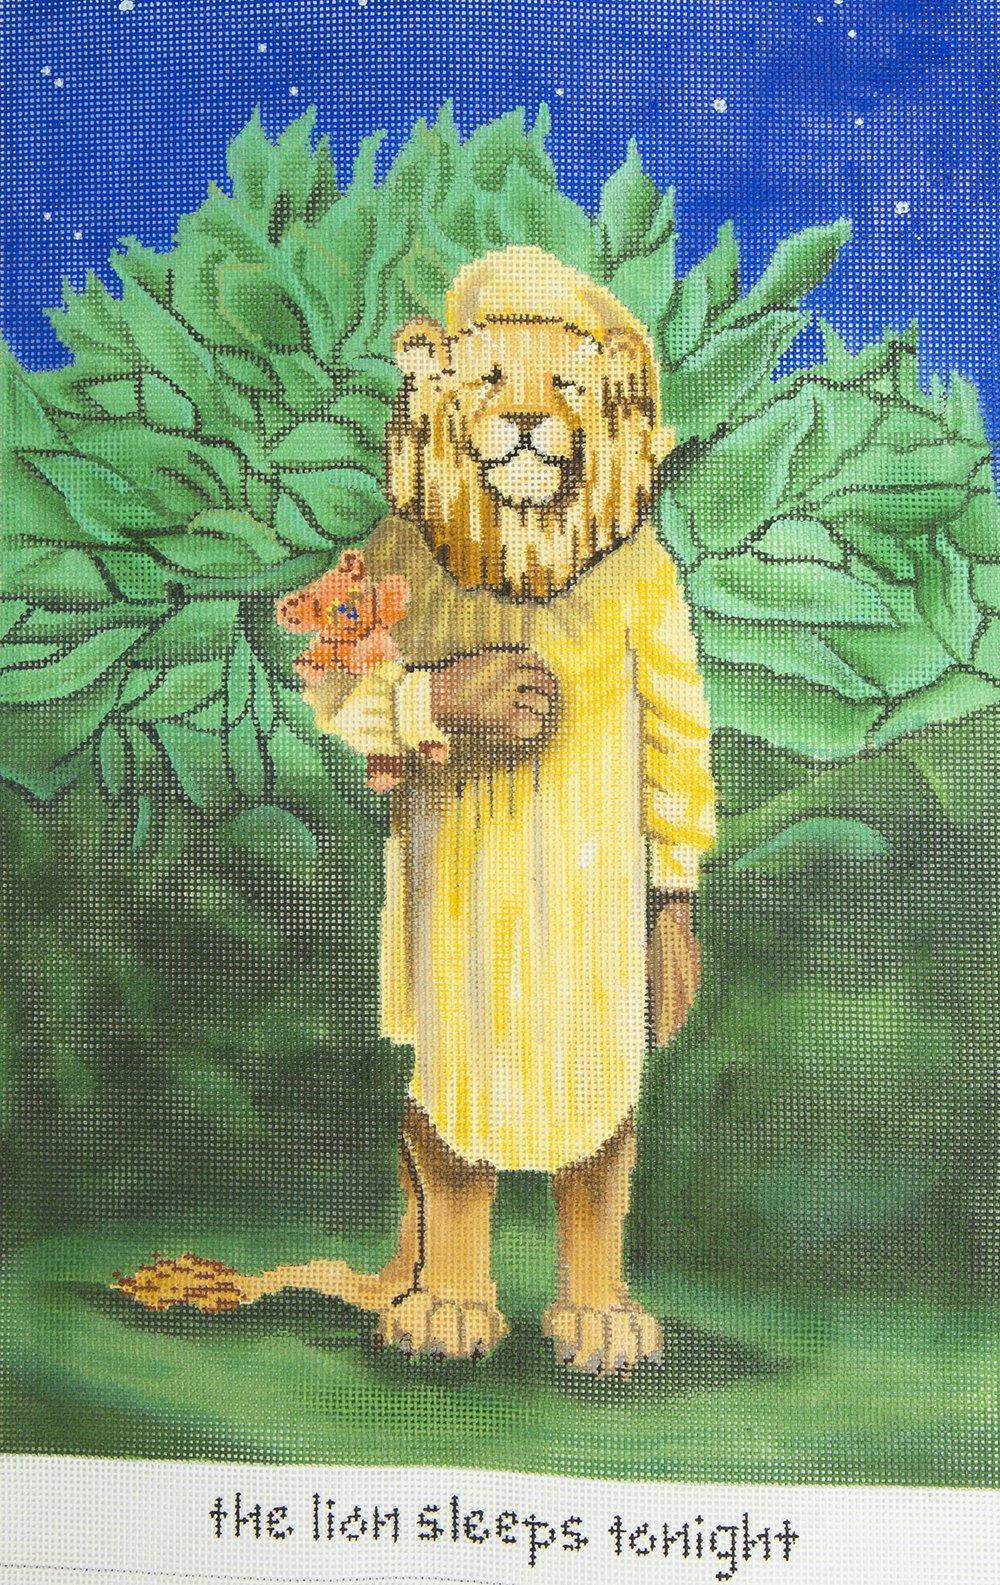 WBPL03 The Lion Sleeps Tonight CBK